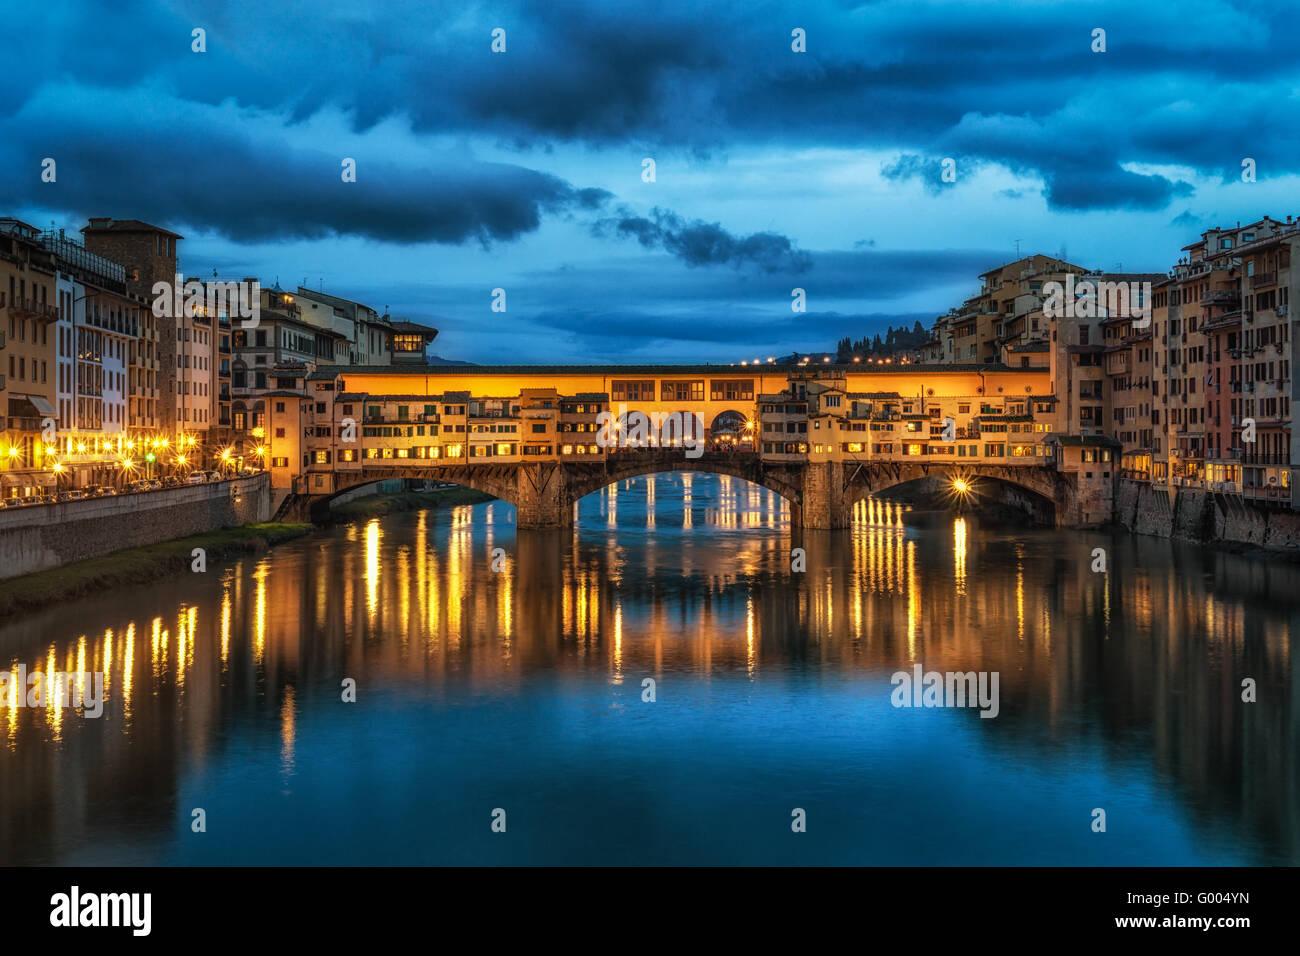 Night reflection of Ponte Vecchio - Stock Image